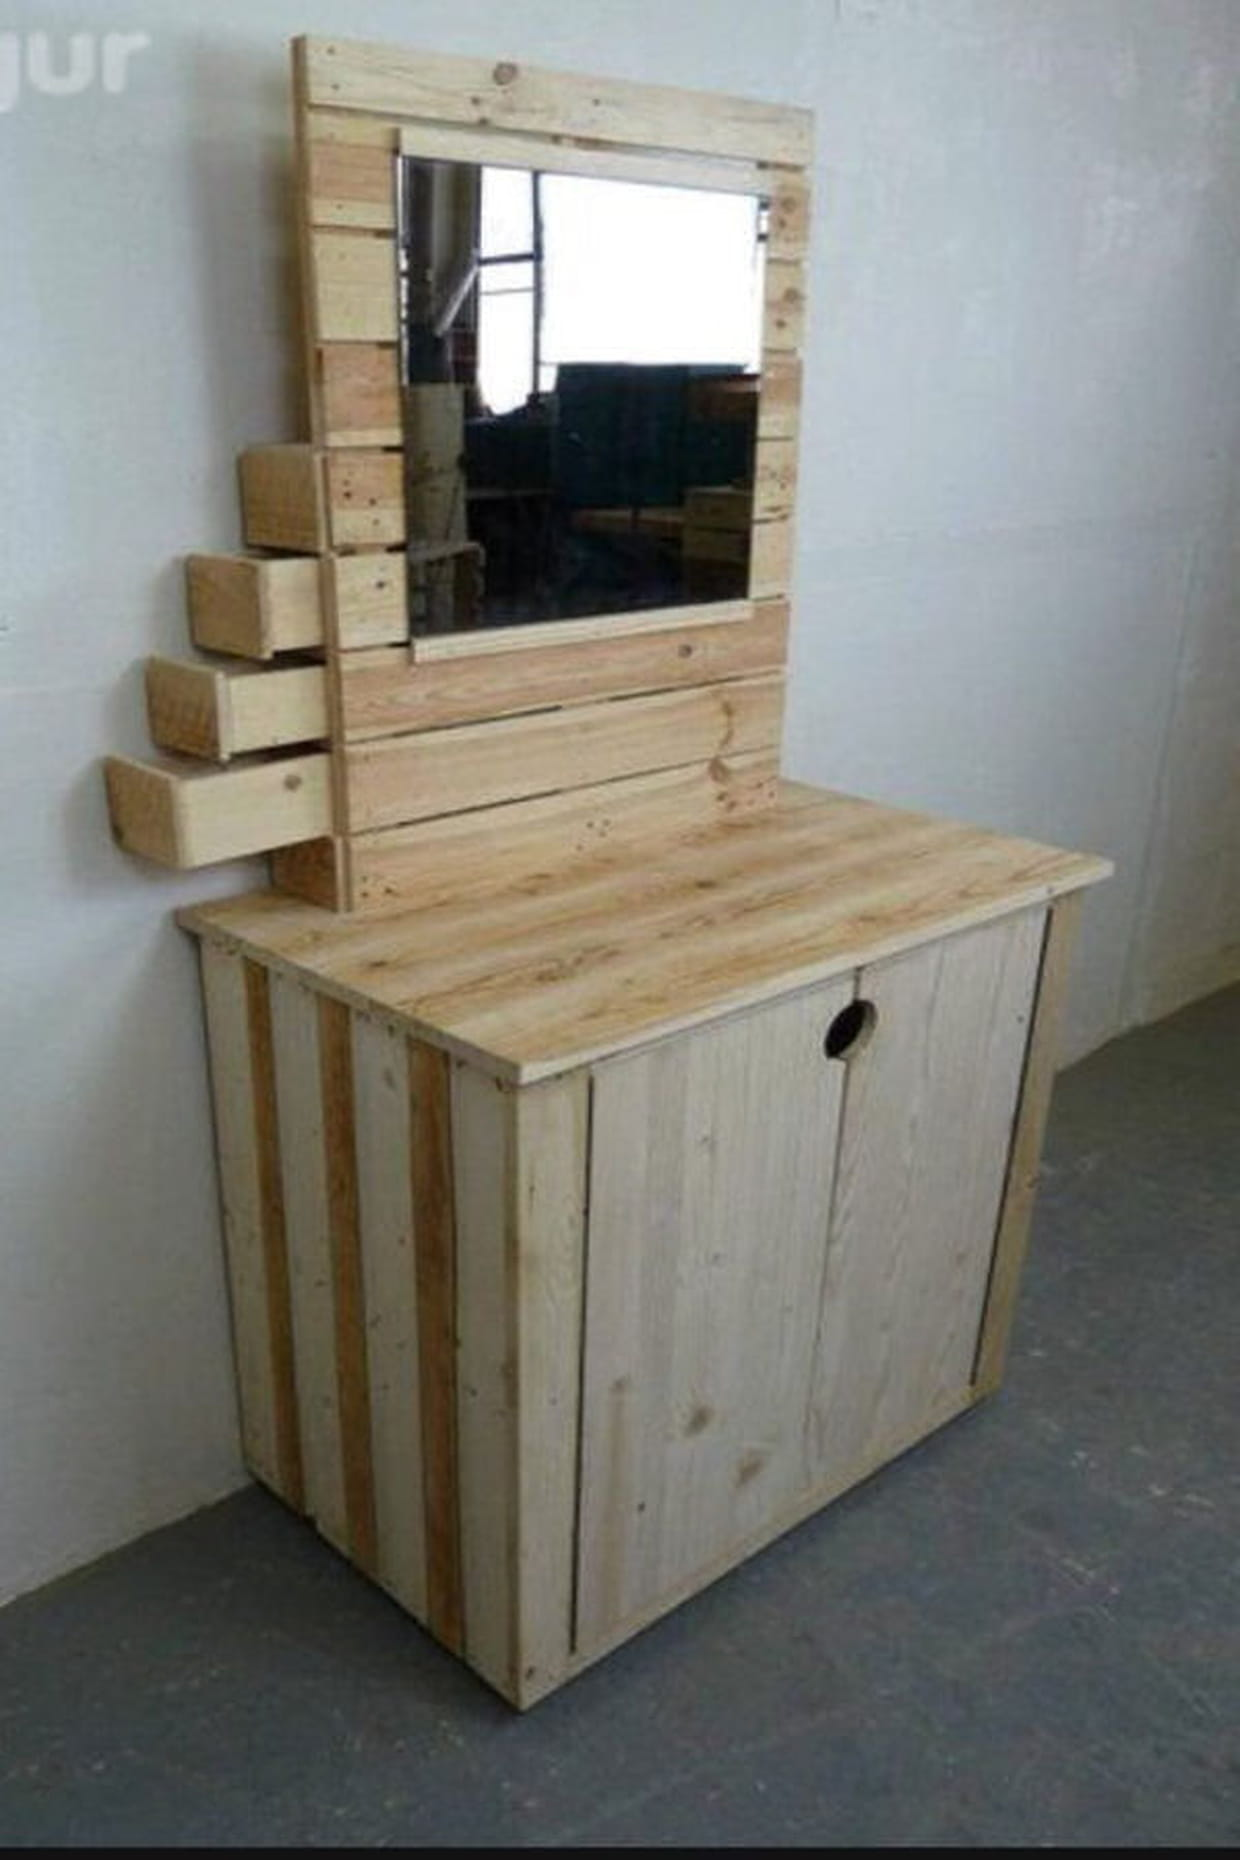 Meuble d entr e bois fashion designs - Meuble d entree en bois ...